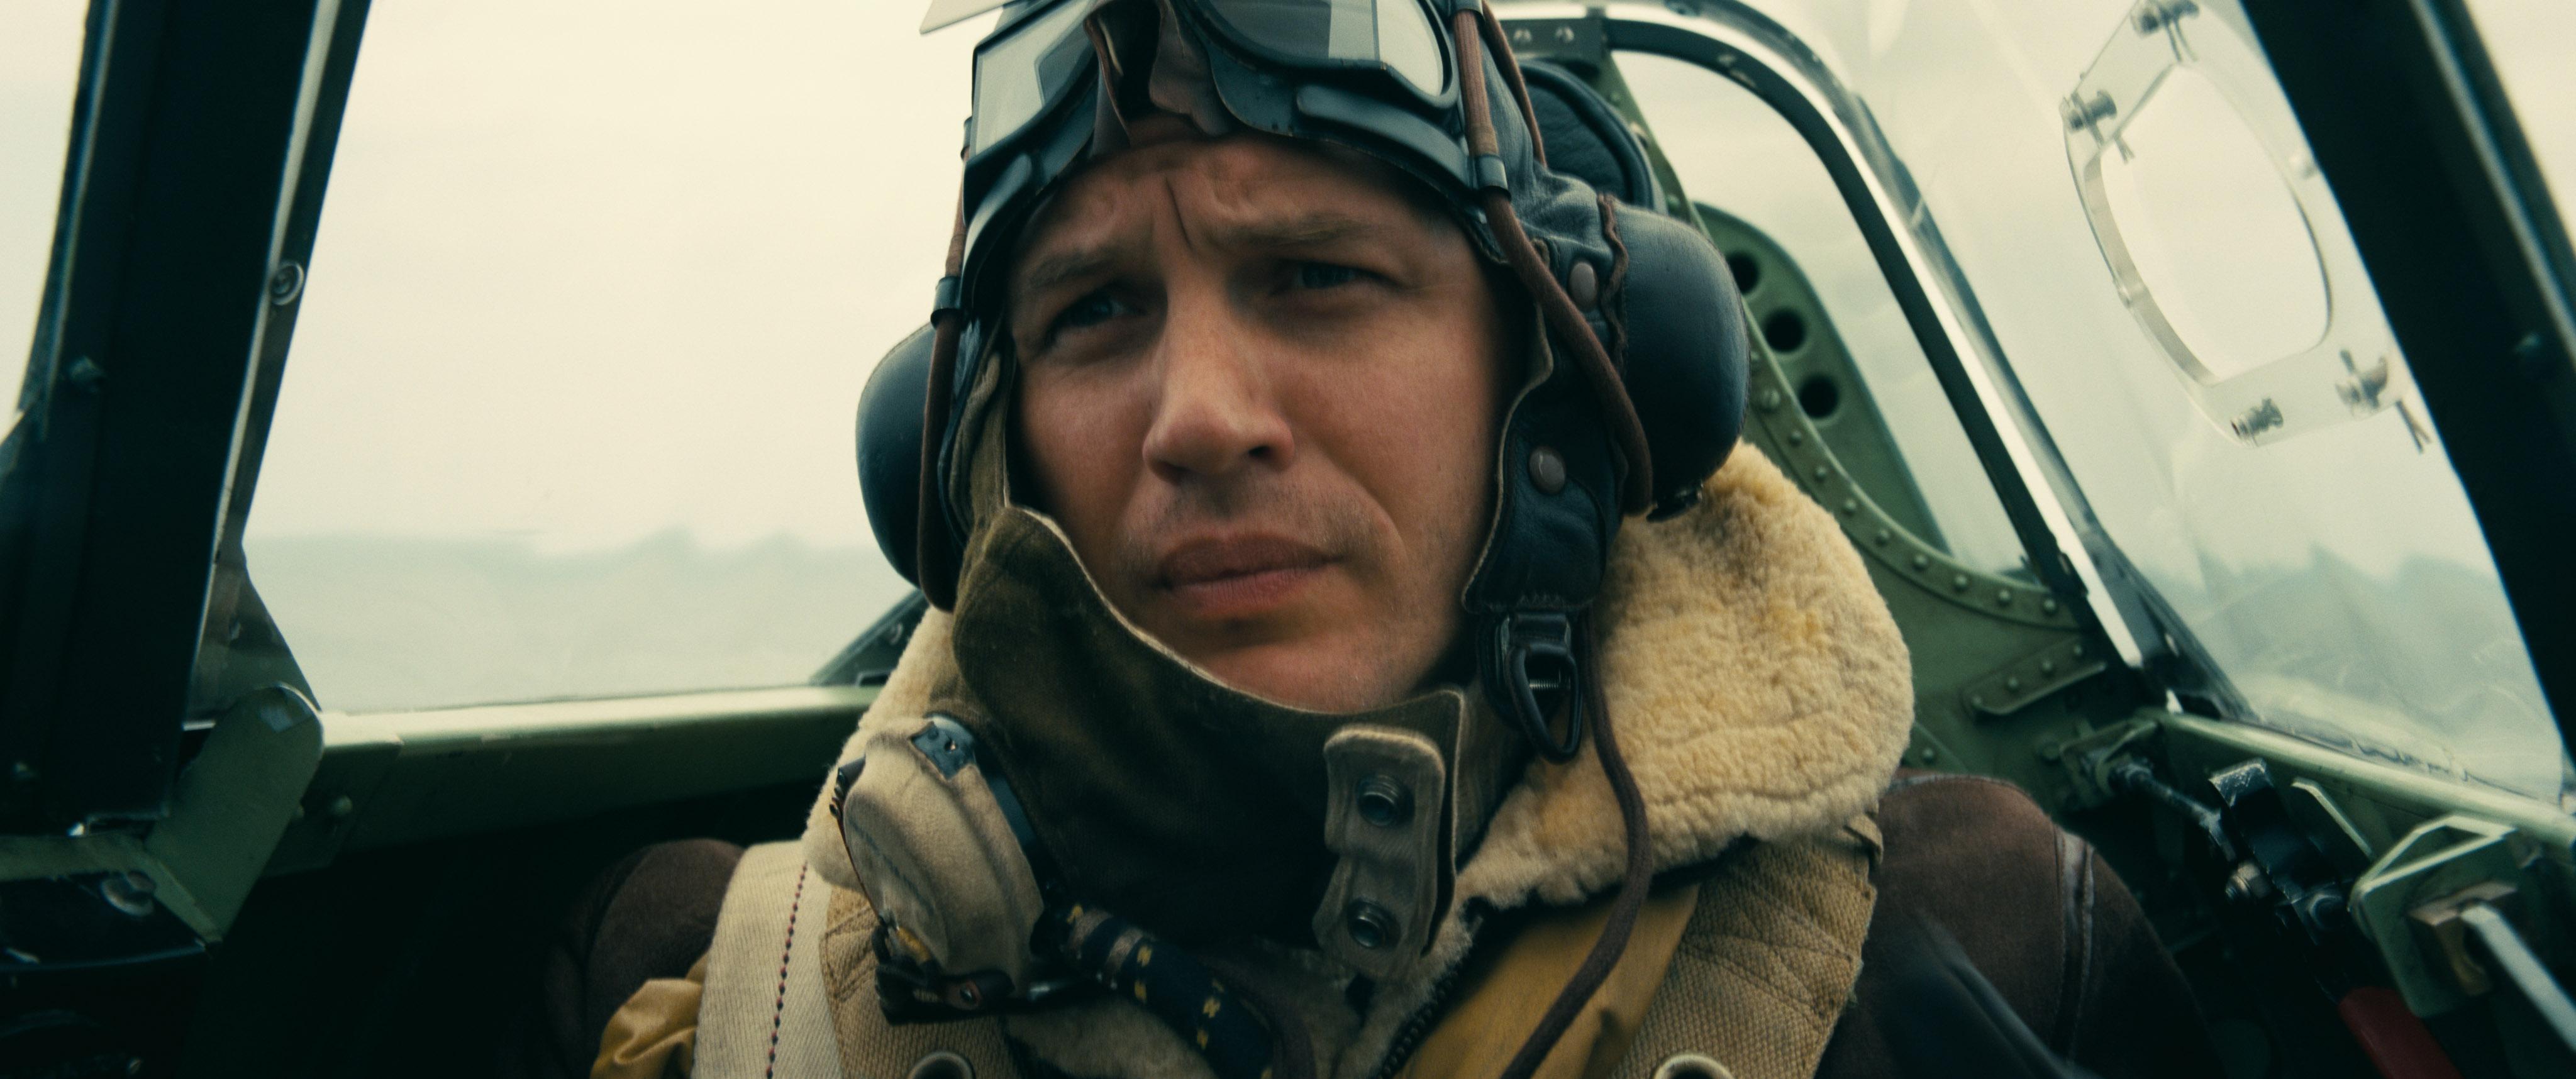 Tom Hardy Dunkirk Havoc